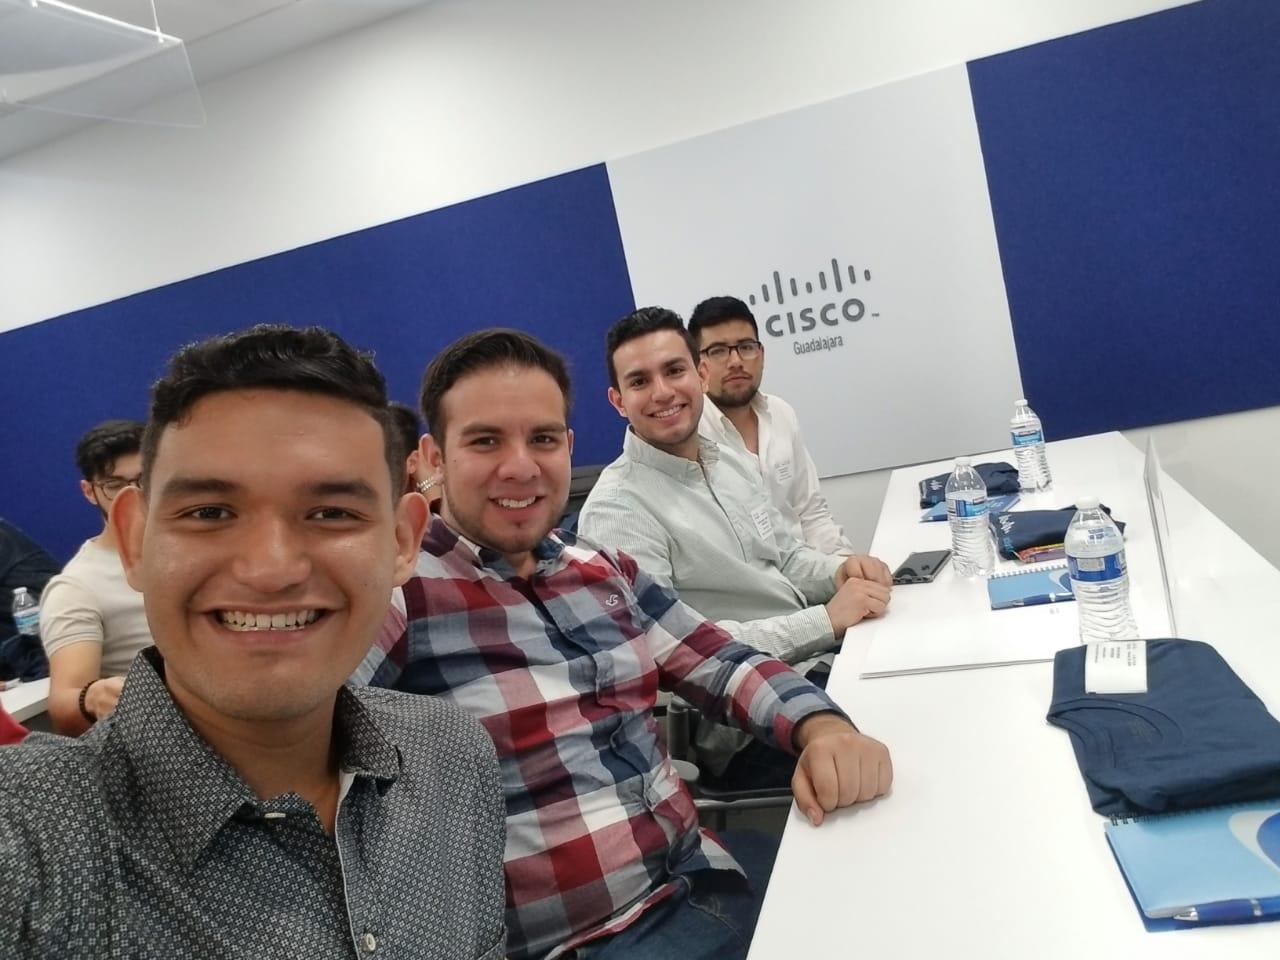 Concurso Cisco México University Challenge; su objetivo: solucionar problemáticas específicas planteadas por la empresa Cisco